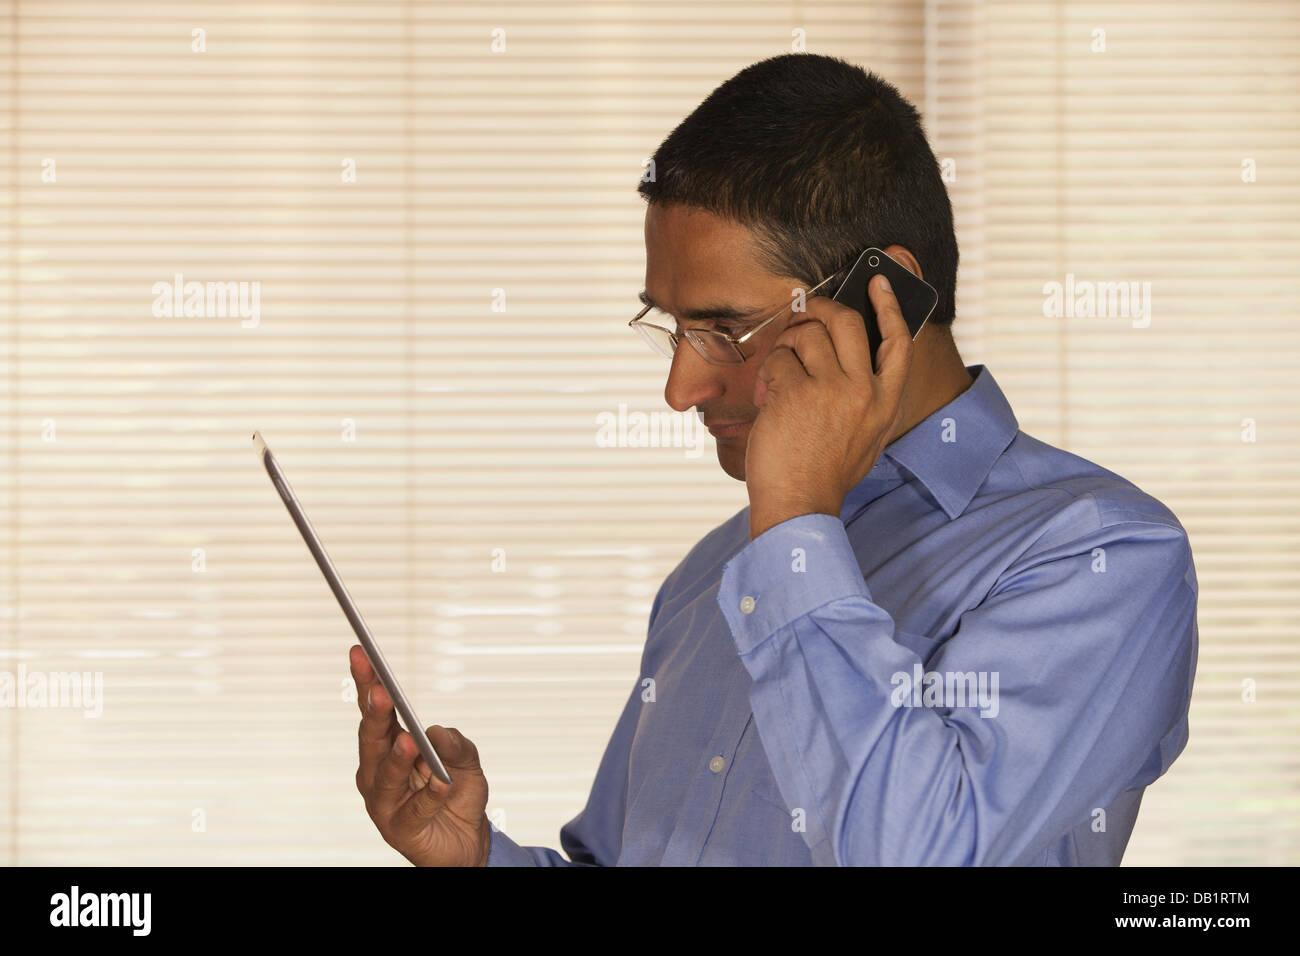 Man on Iphone looking at IPAD - Stock Image